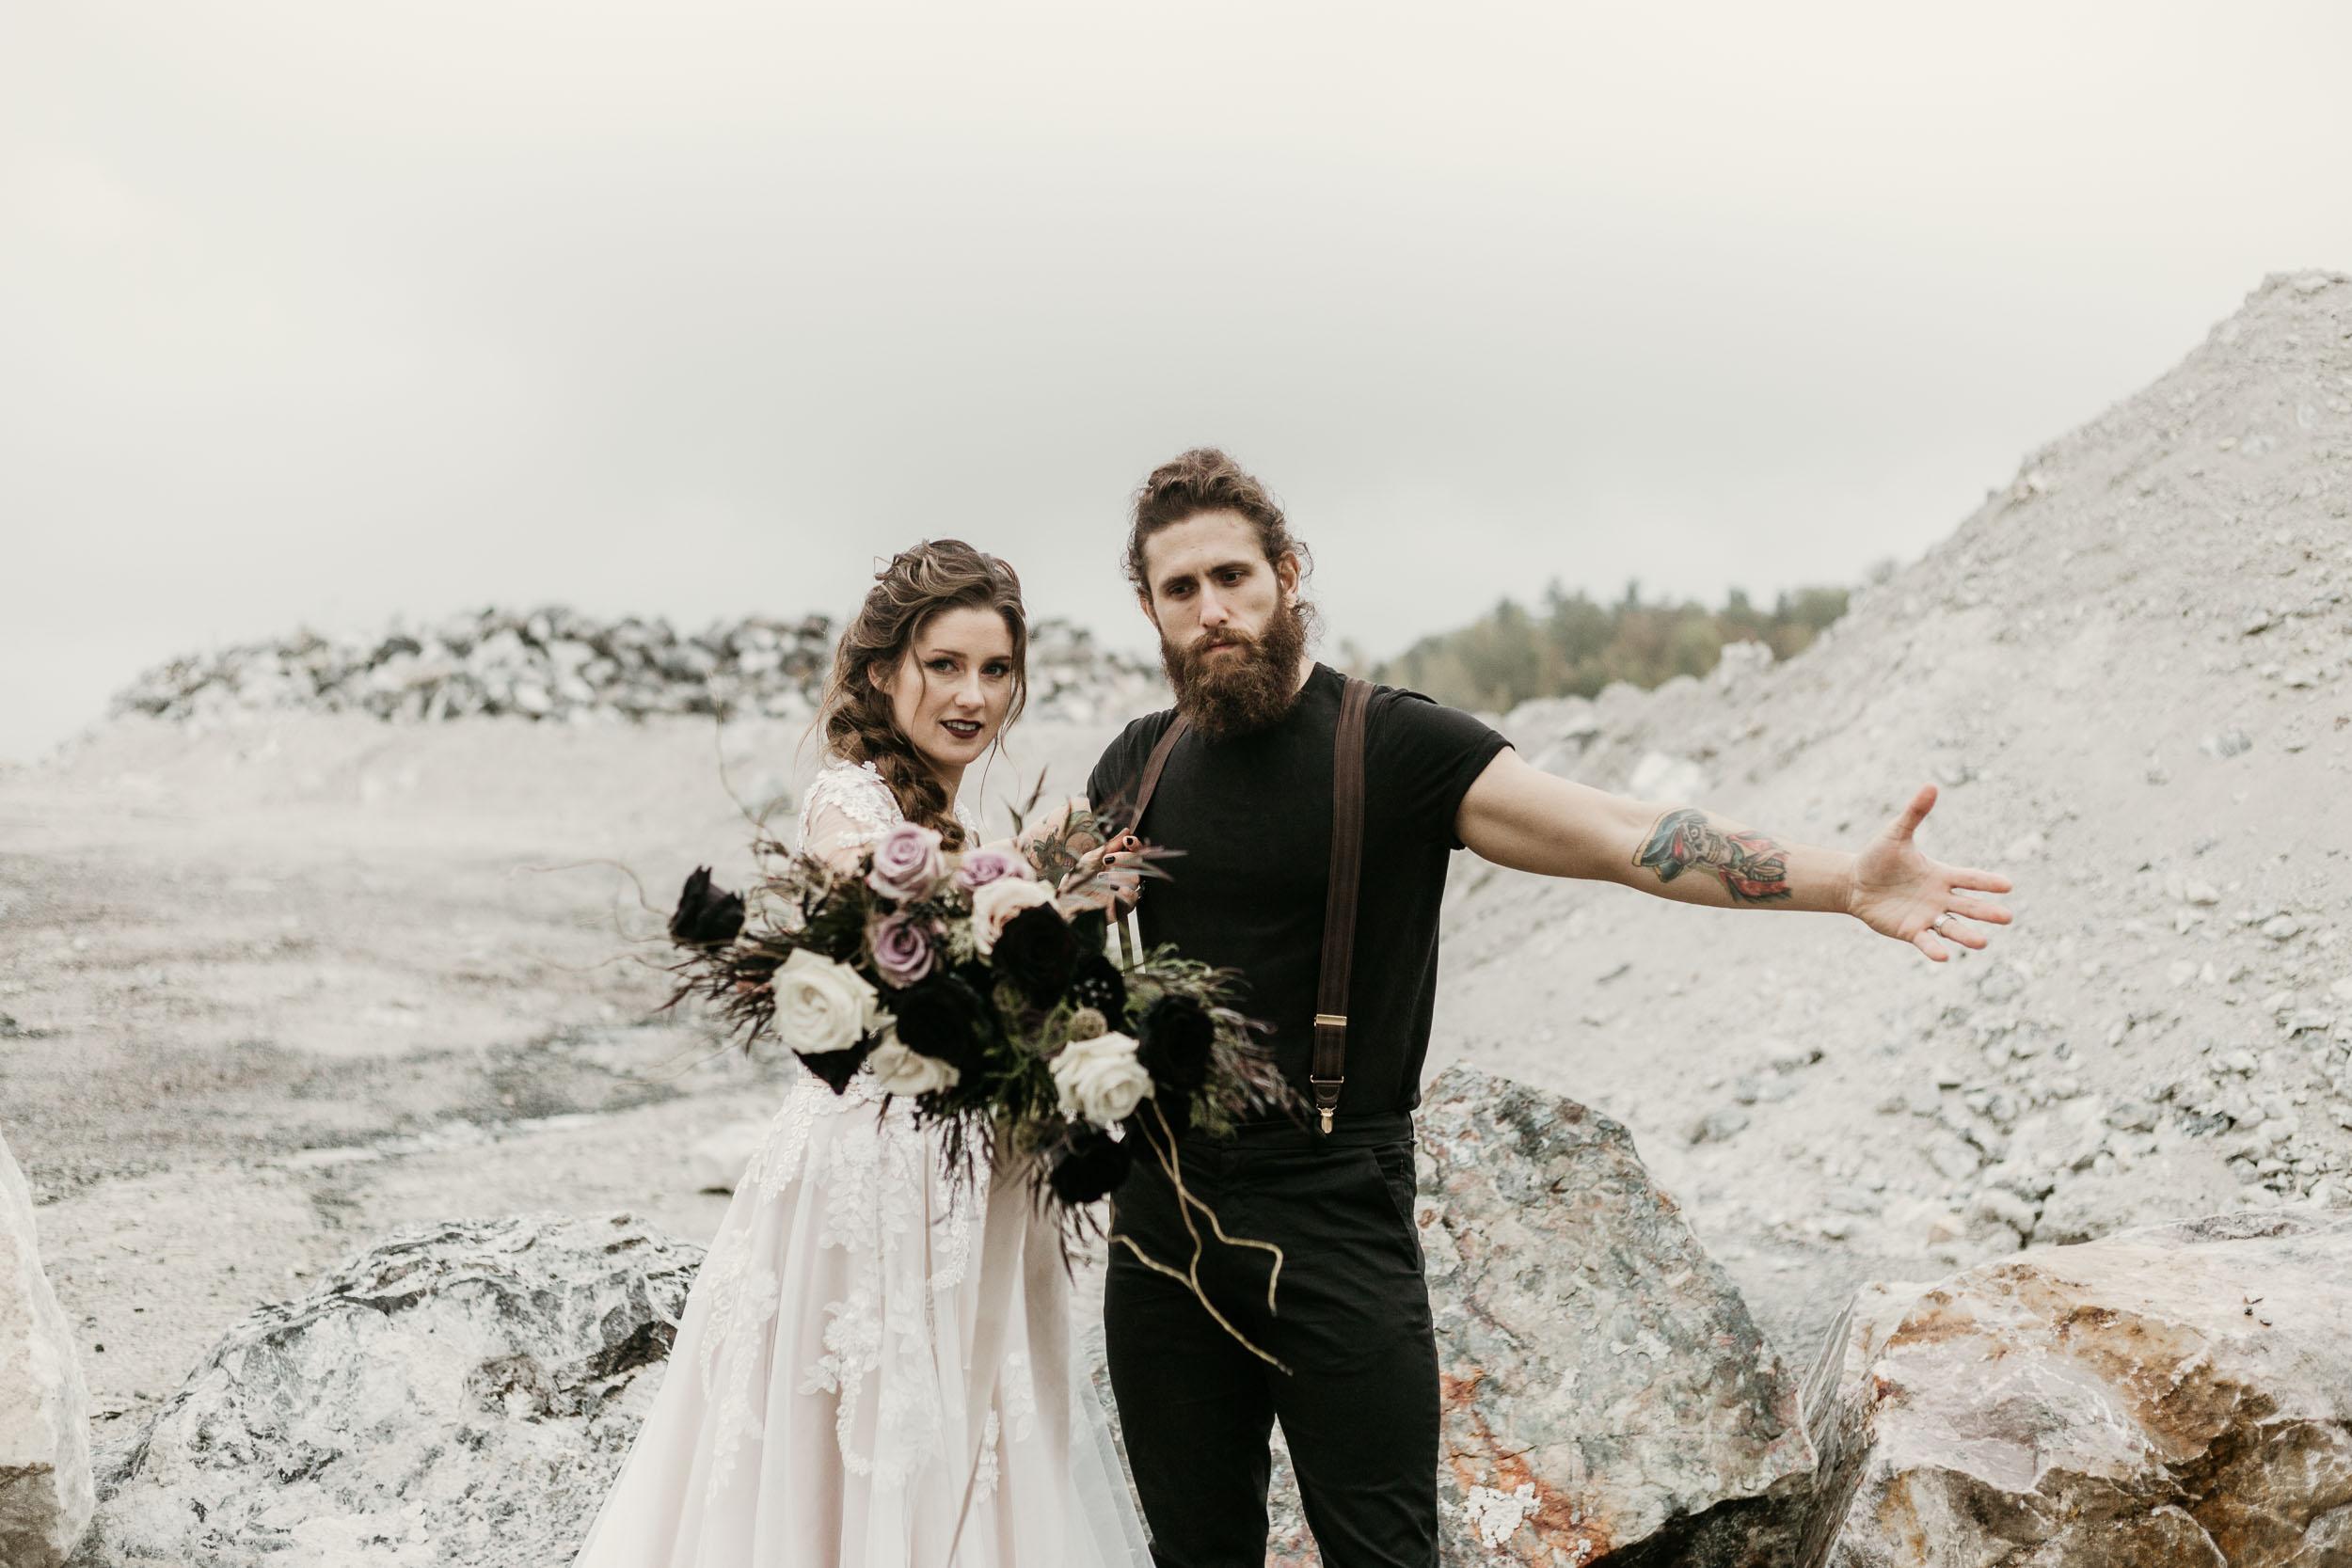 intimate-wedding-elopement-photographer-ottawa-toronto-1156.jpg